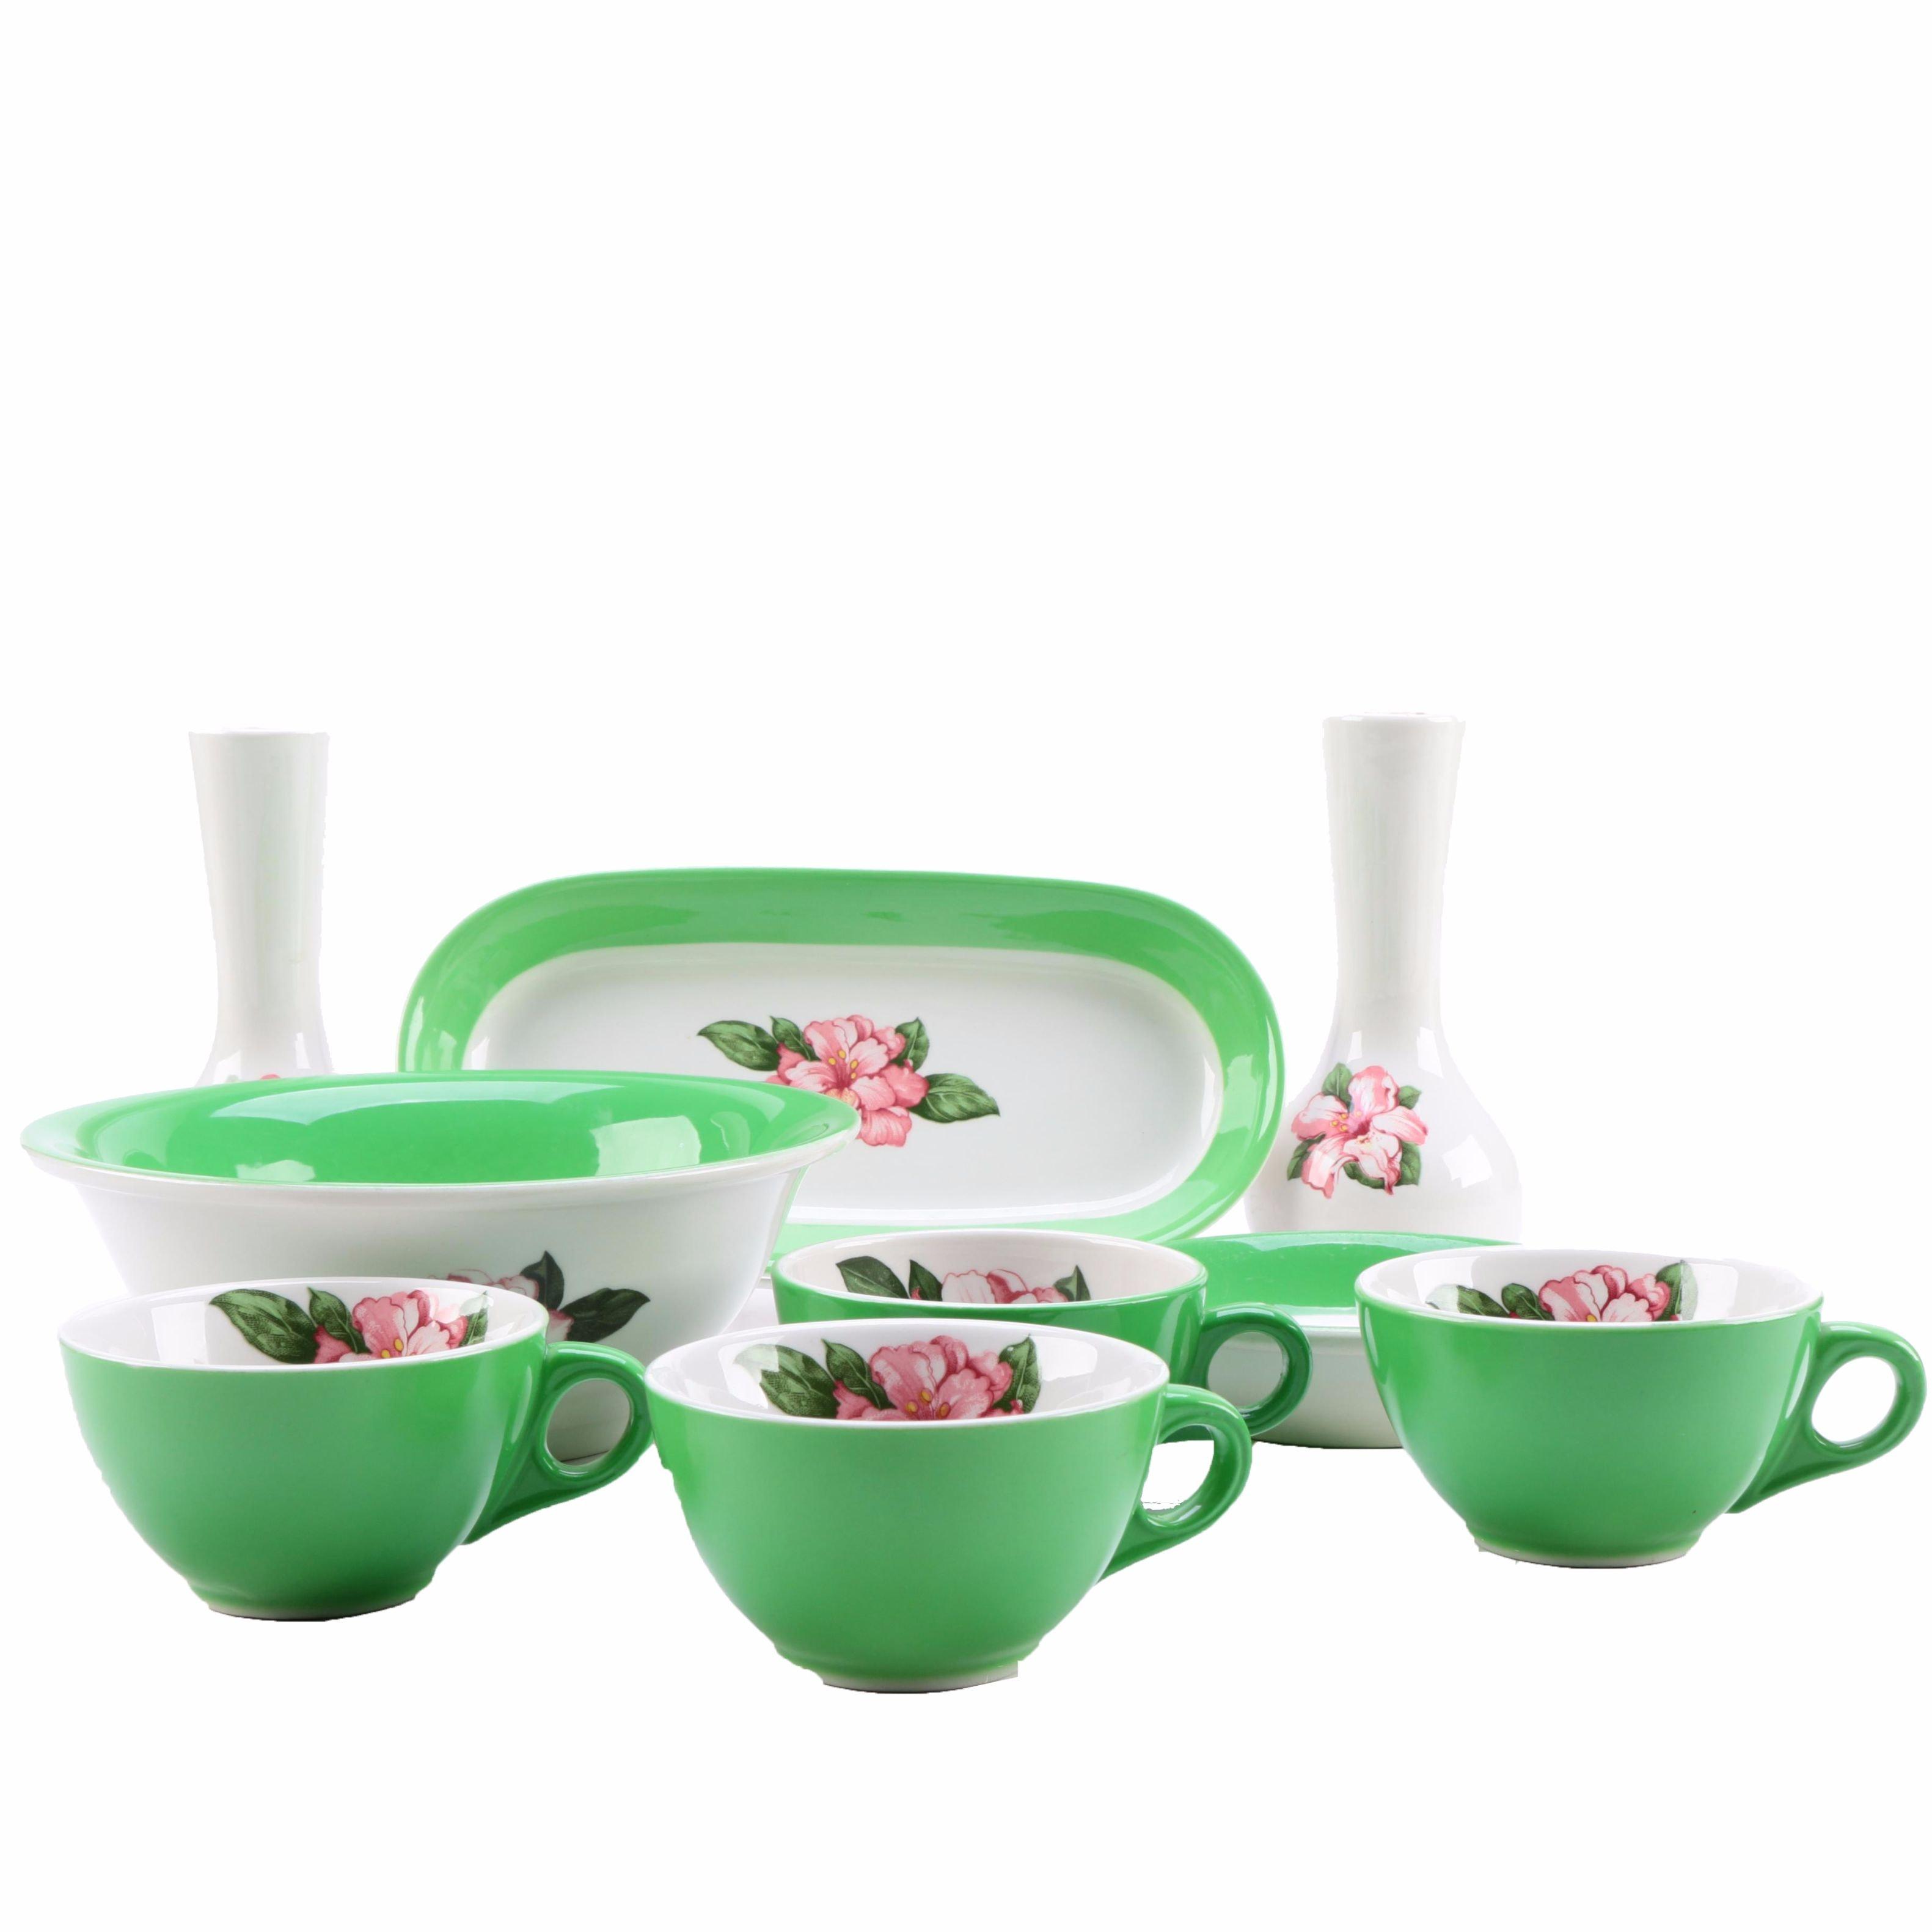 Shernango China Ceramic Tea Set